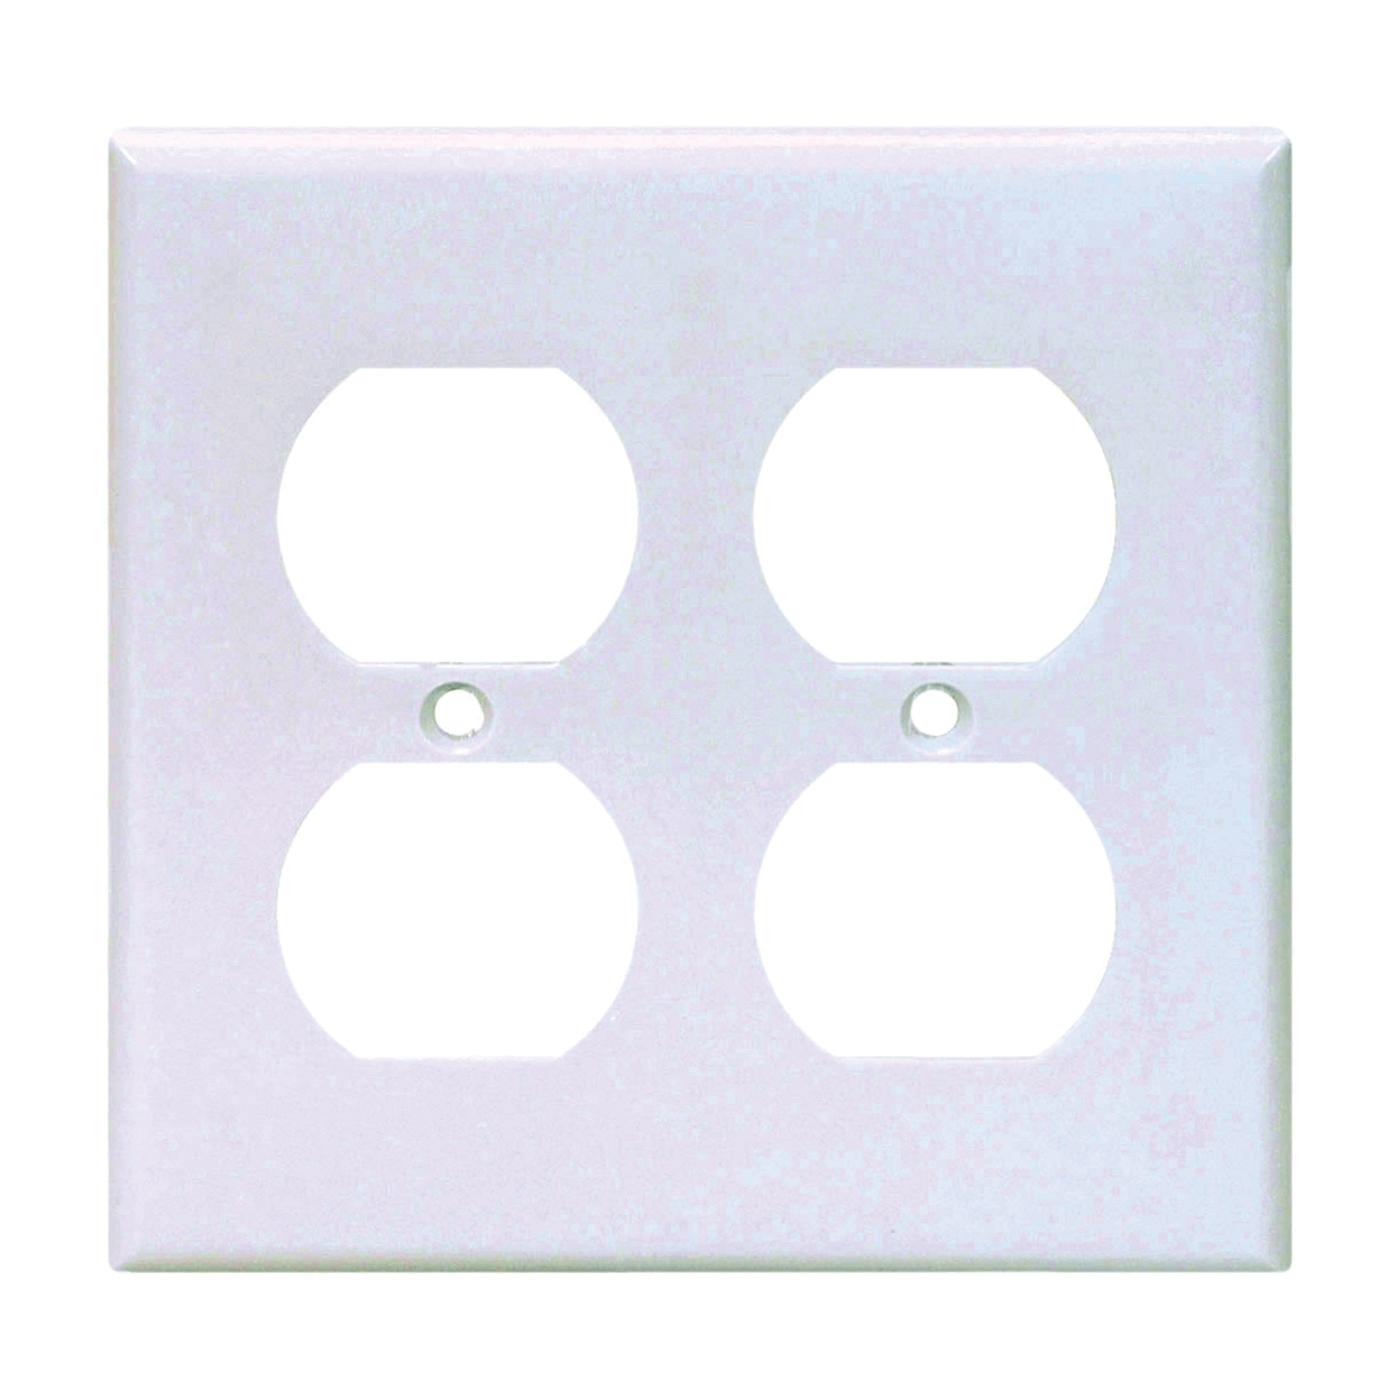 Eaton Wiring Devices 2150W-BOX